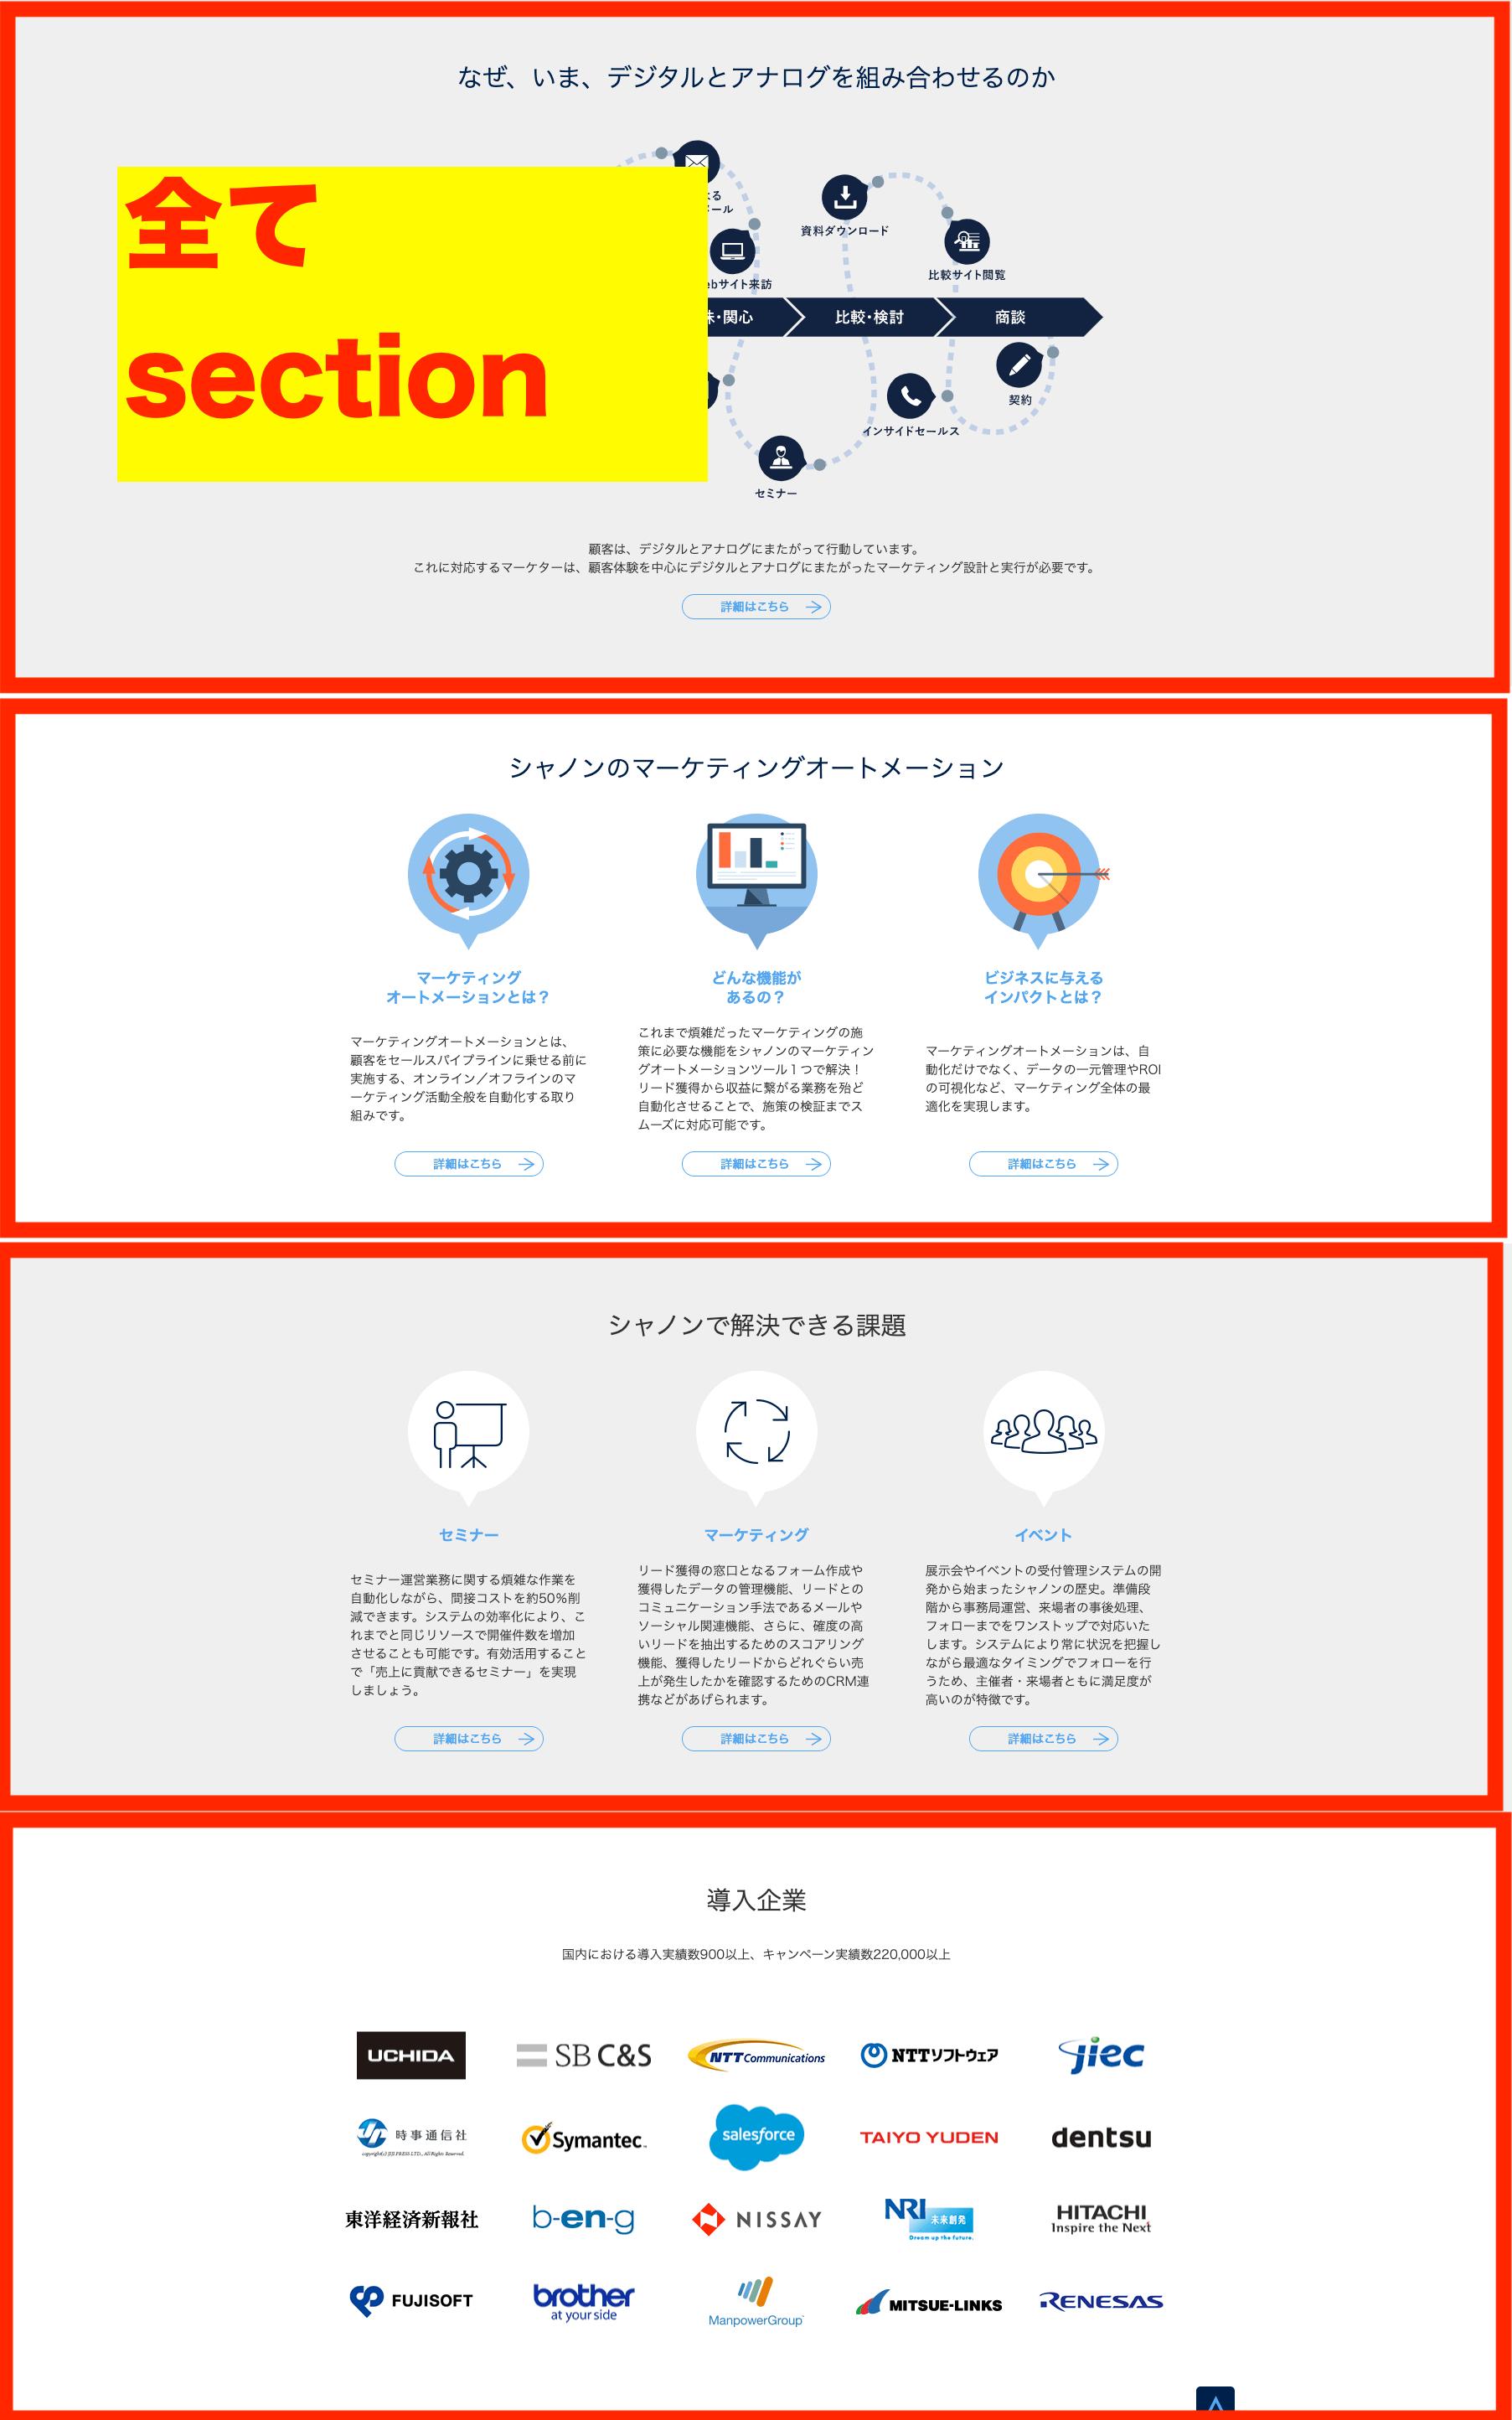 screencapture-shanon-co-jp-2019-12-03-17_51_21.png